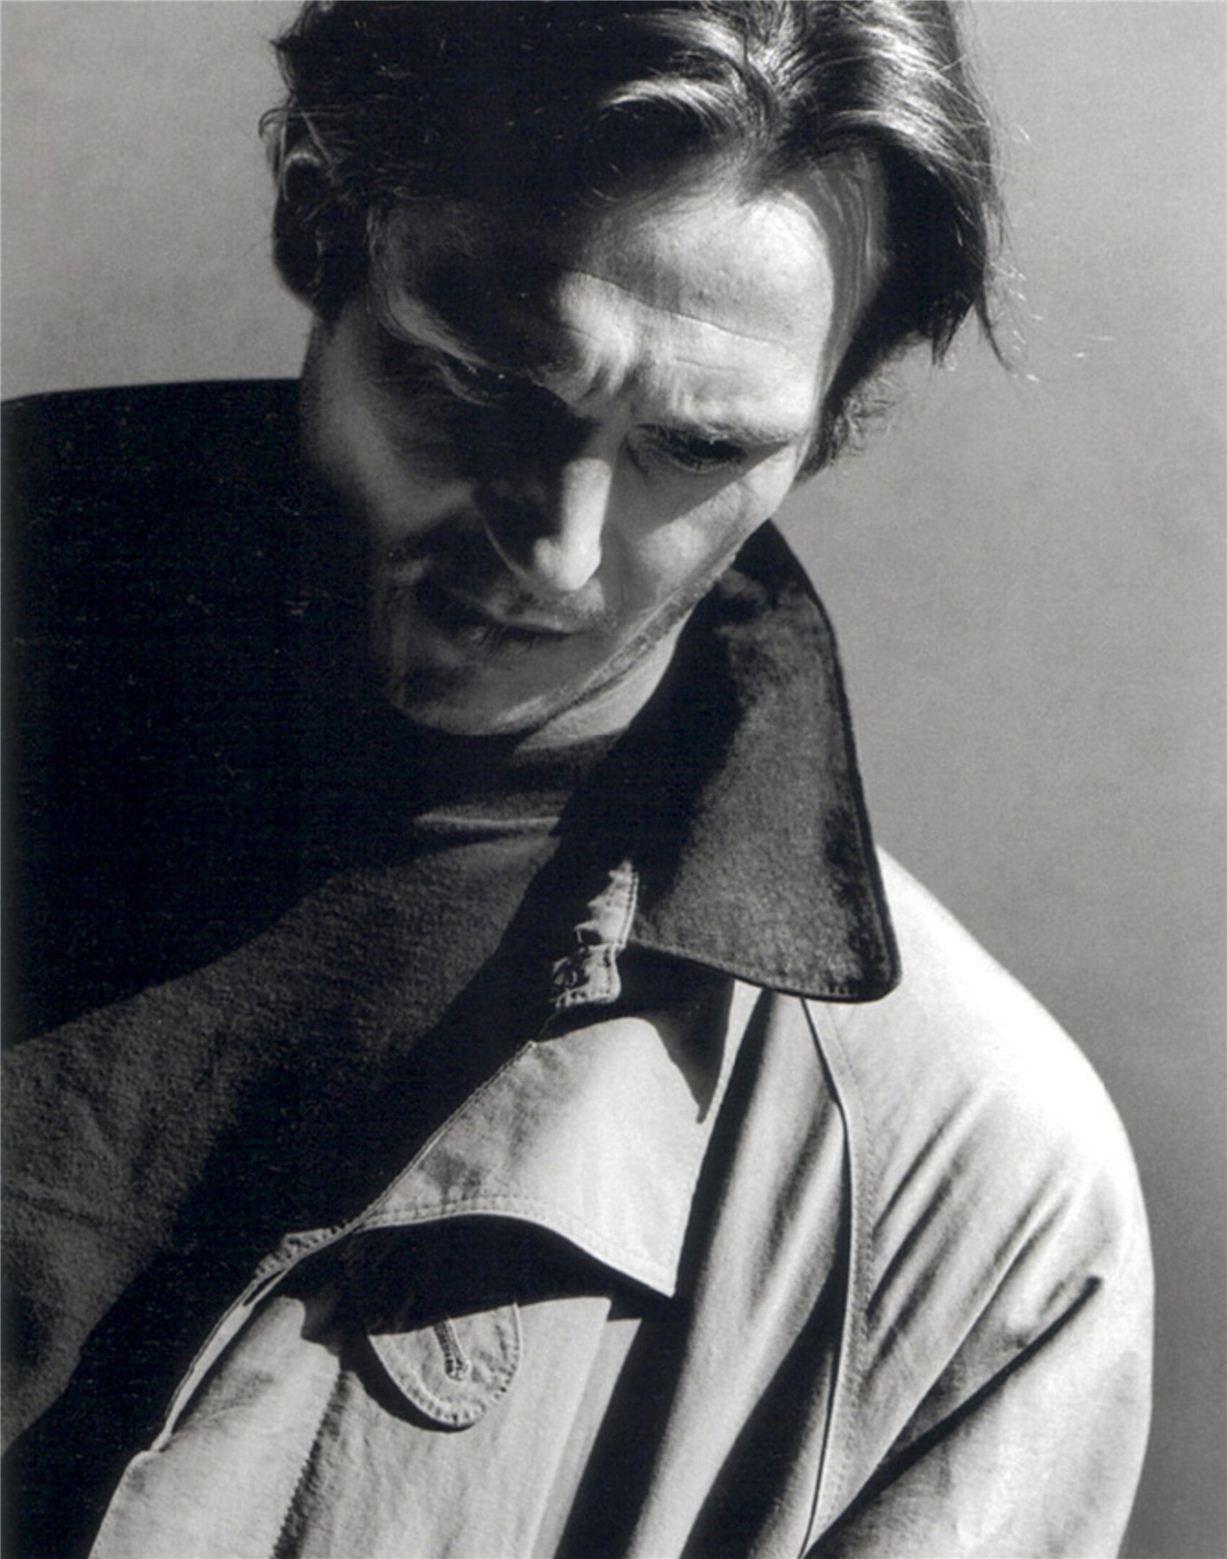 Liam Neeson / Лиам Нисон - портрет фотографа Грега Гормана / Greg Gorman